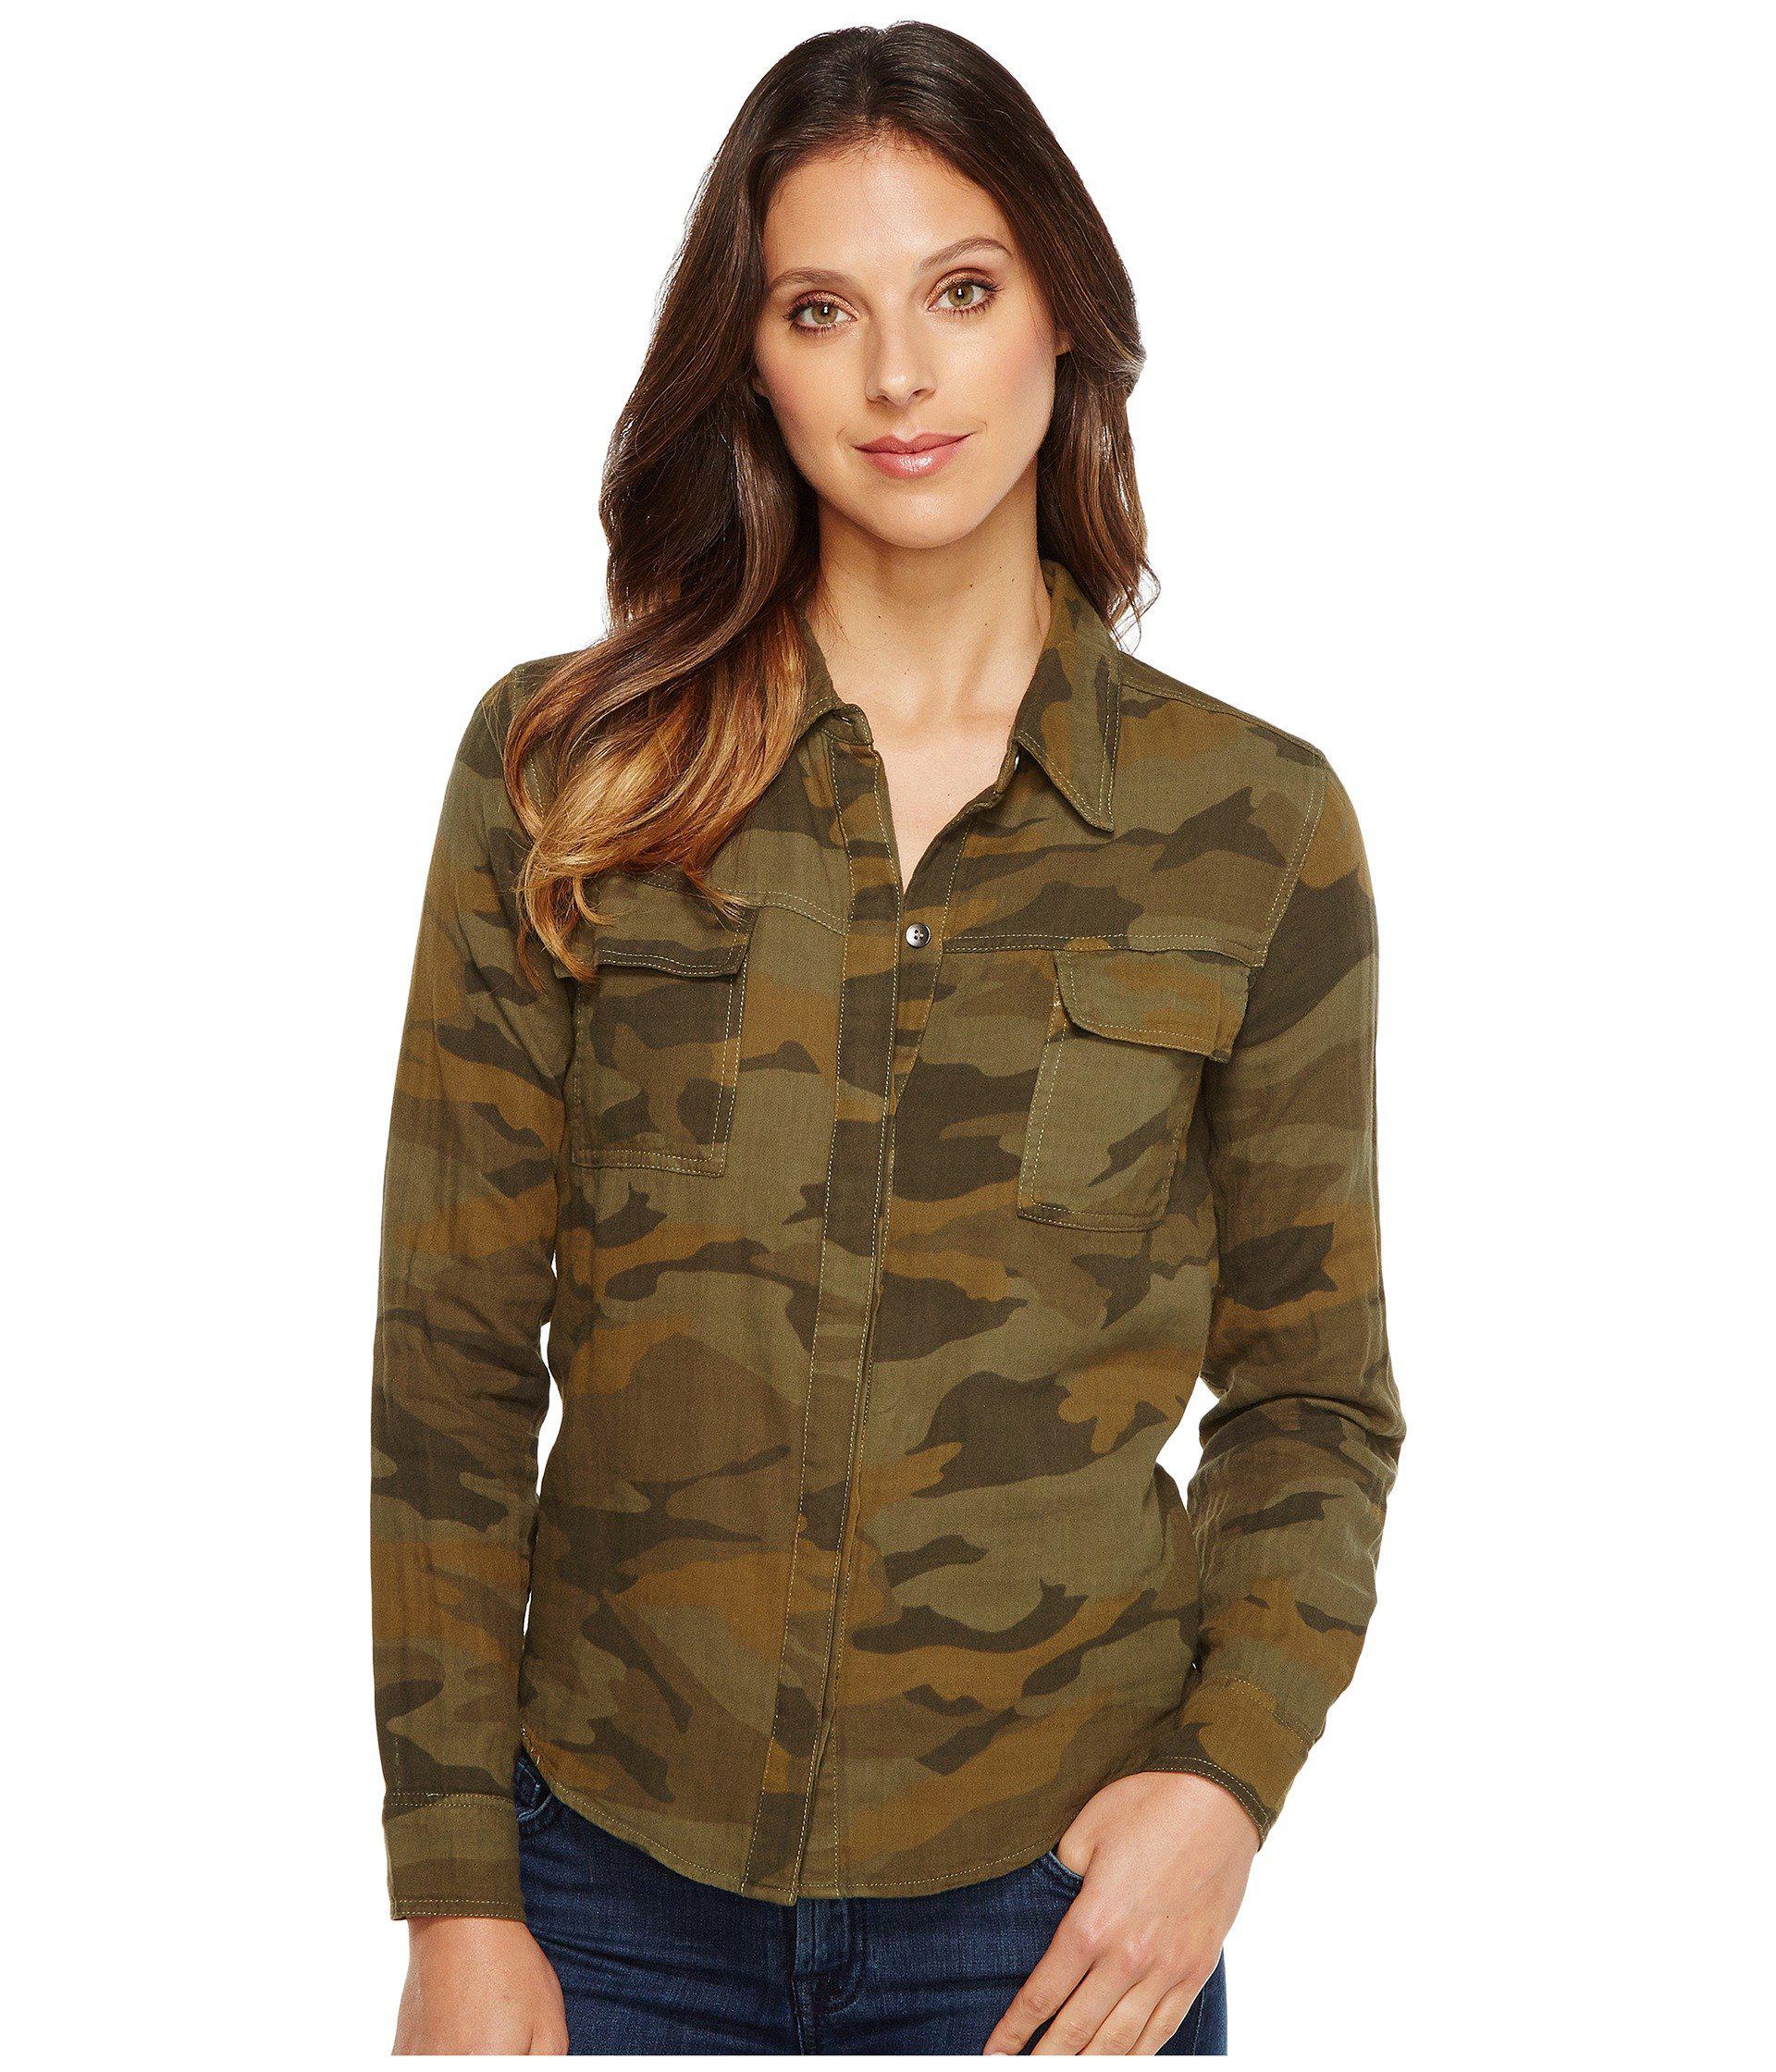 12fad10a2 Lyst - Splendid Camo Print Double Cloth Shirt in Green